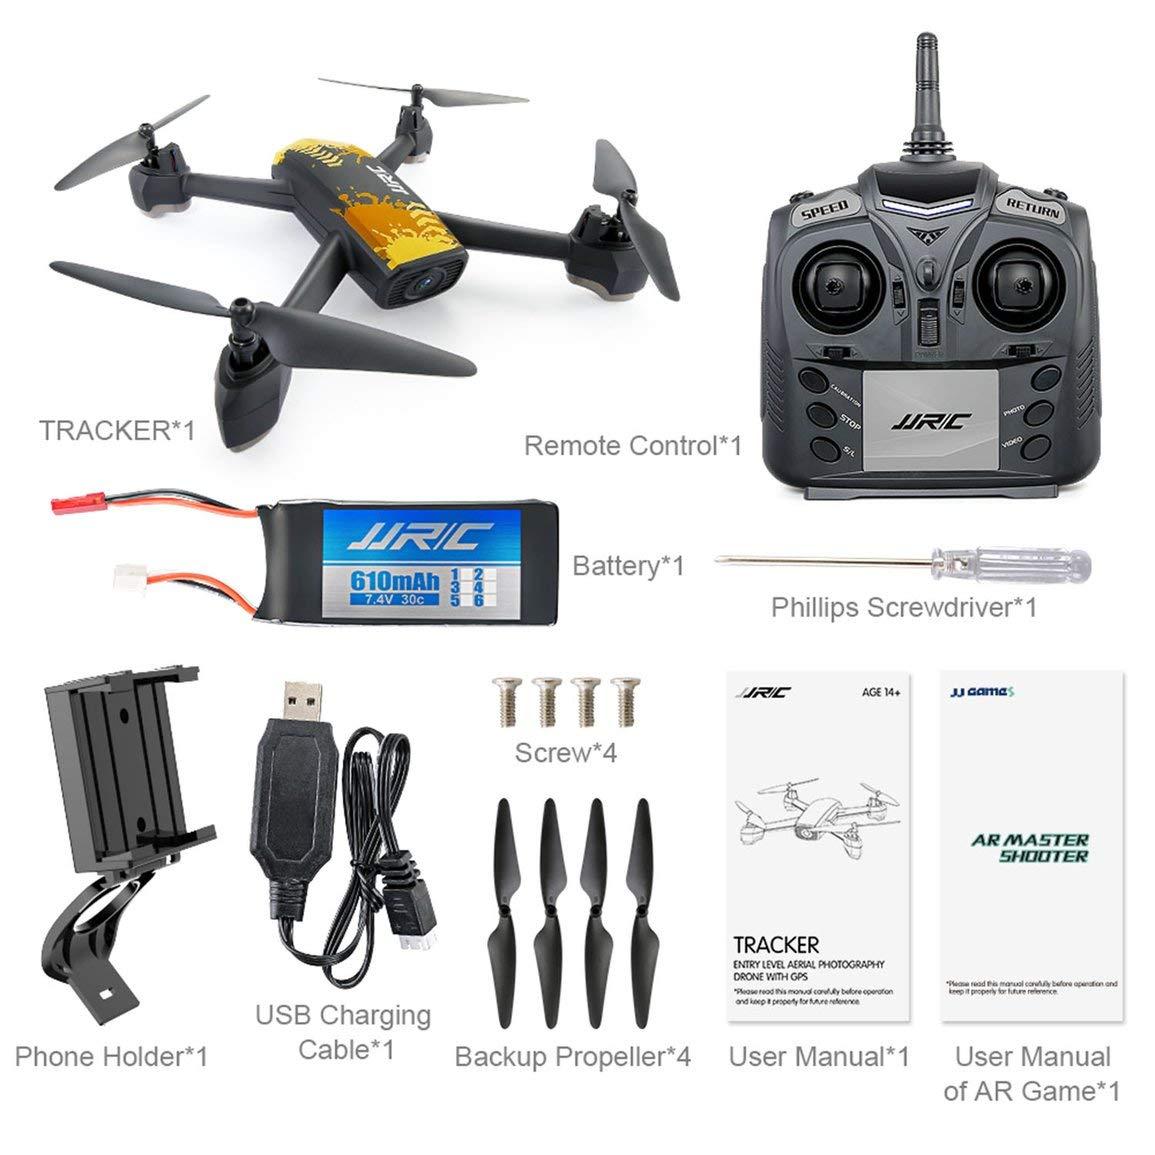 Fantasyworld JJR / C JJRC H55 Professionelle RC Drone Quadcopter Ersatzteile WiFi GPS Hubschrauber RC Drone mit 720p-Kamera